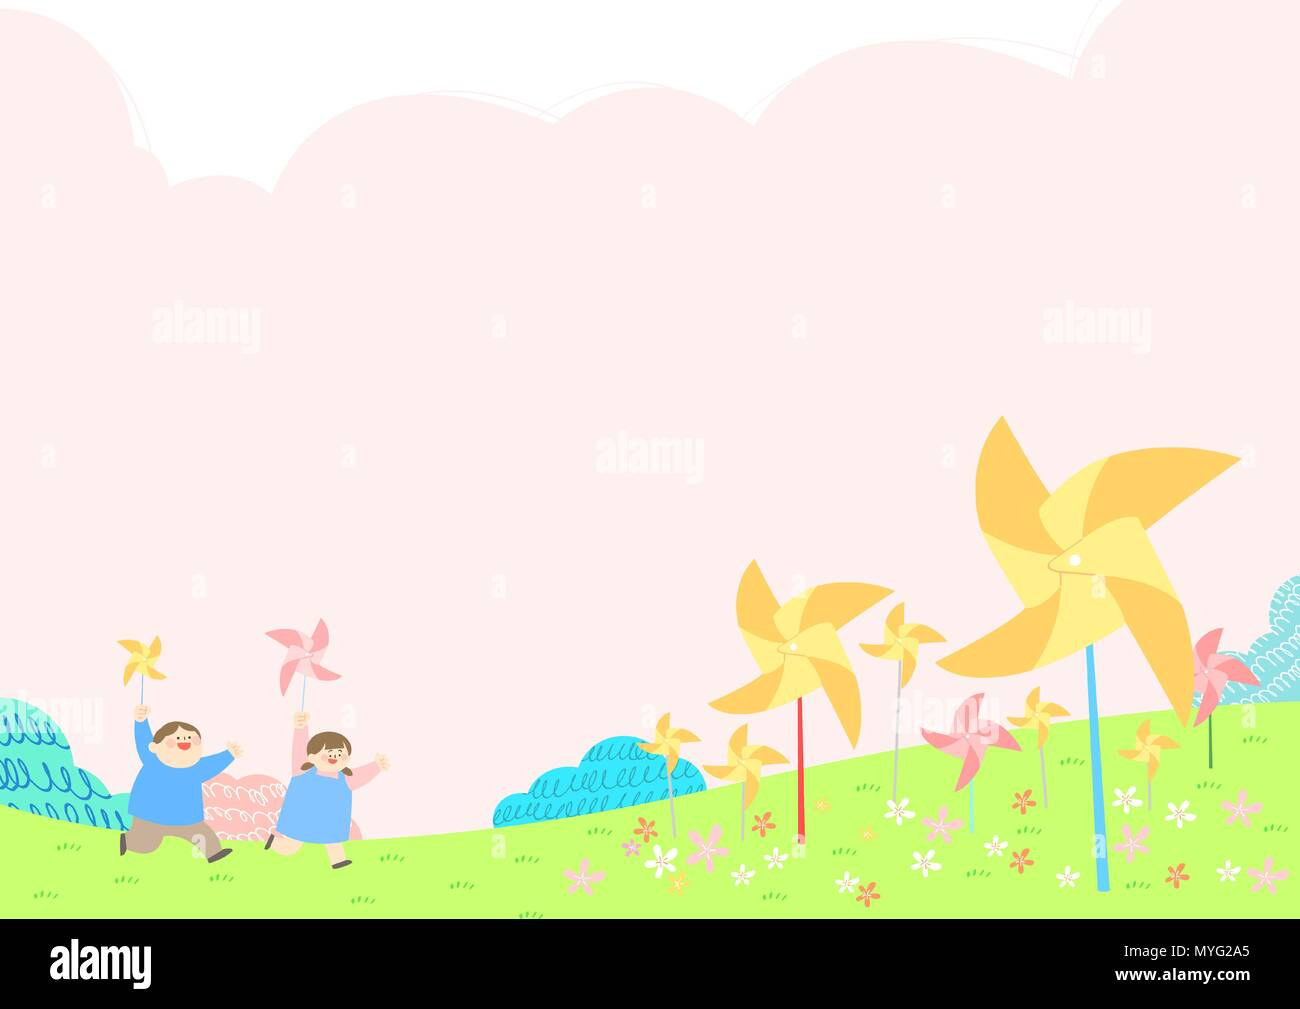 Vector - Welcome spring. Enjoy spring time illustration 011 - Stock Vector